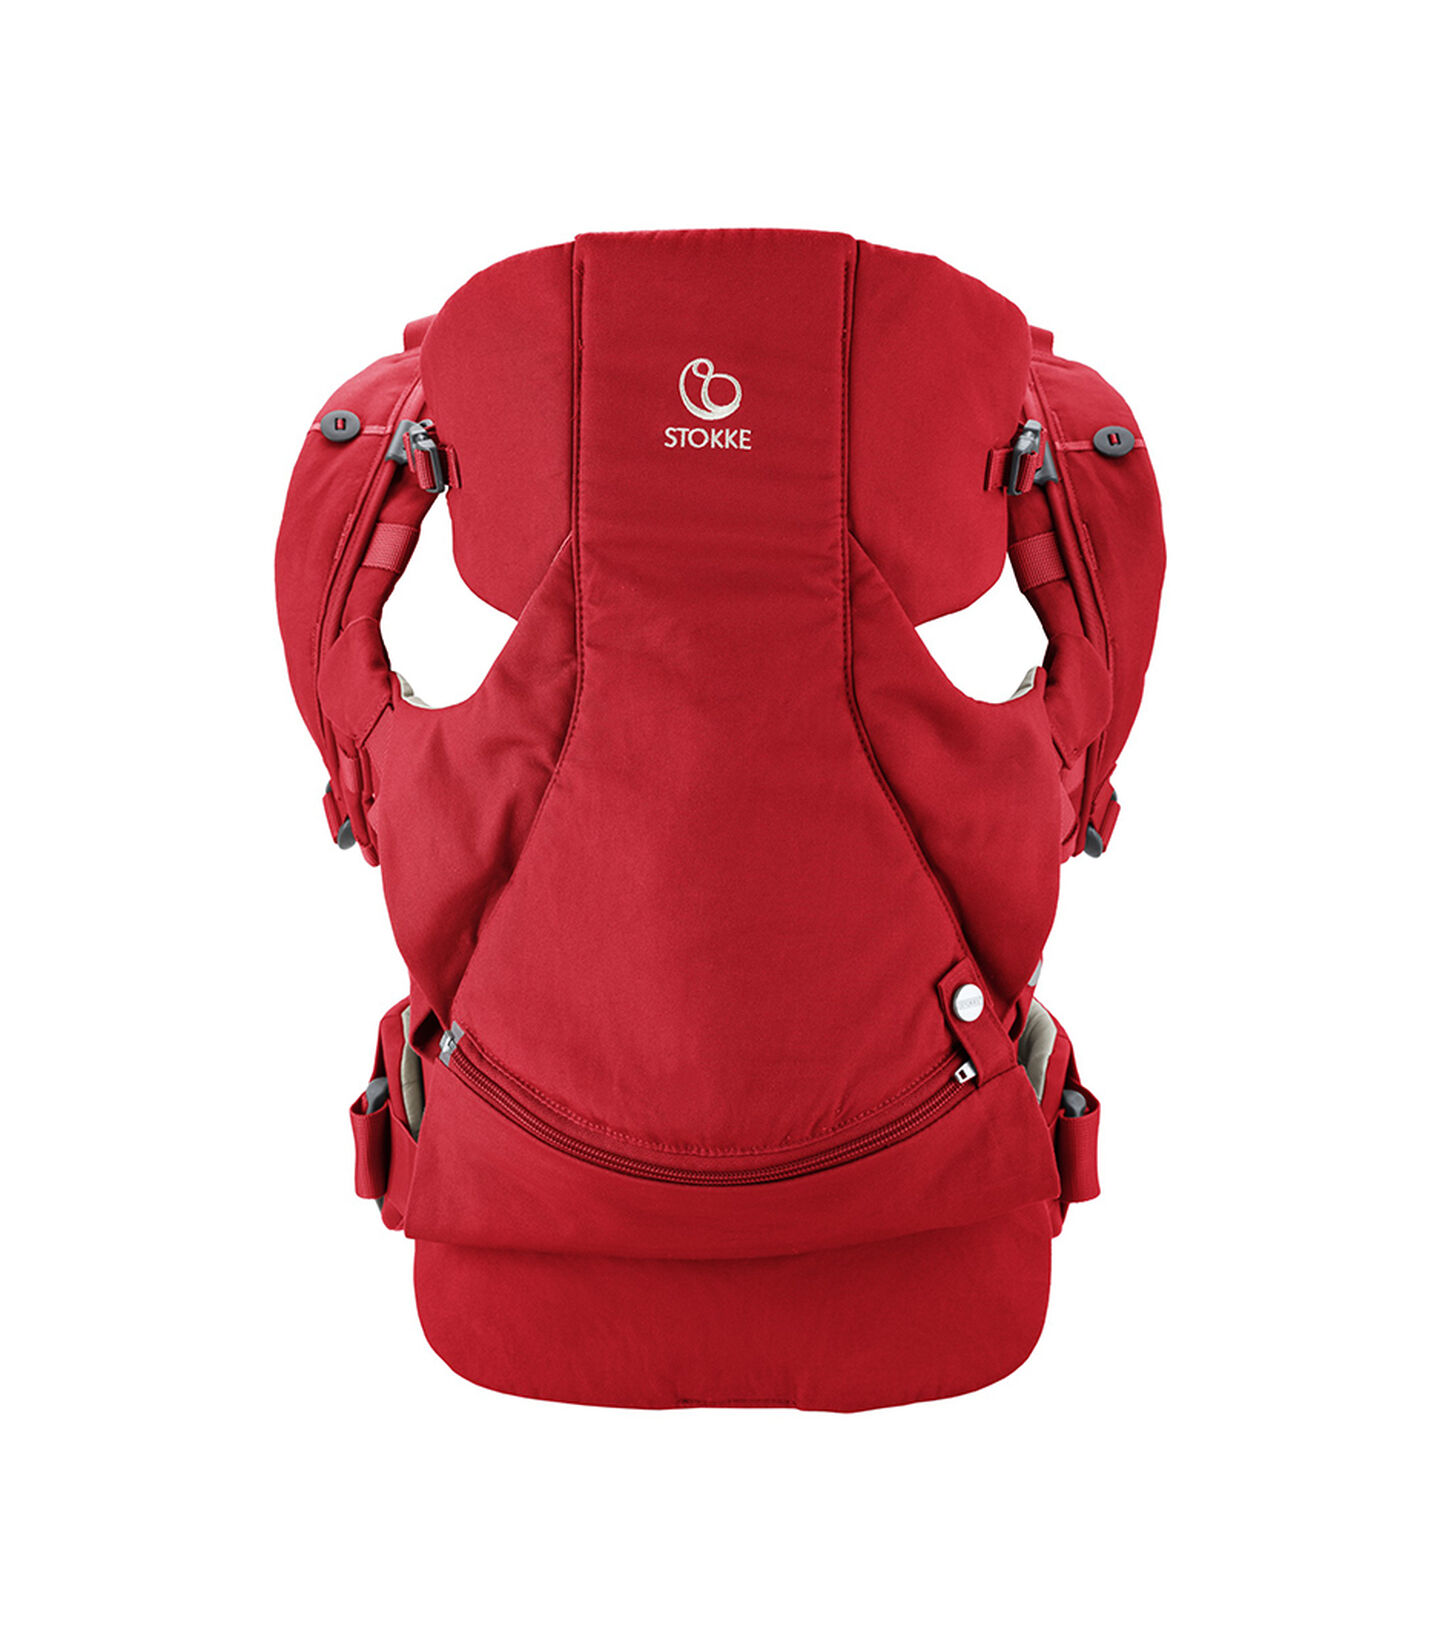 Stokke® MyCarrier™ Mochila frontal y dorsal Rojo, Rojo, mainview view 2